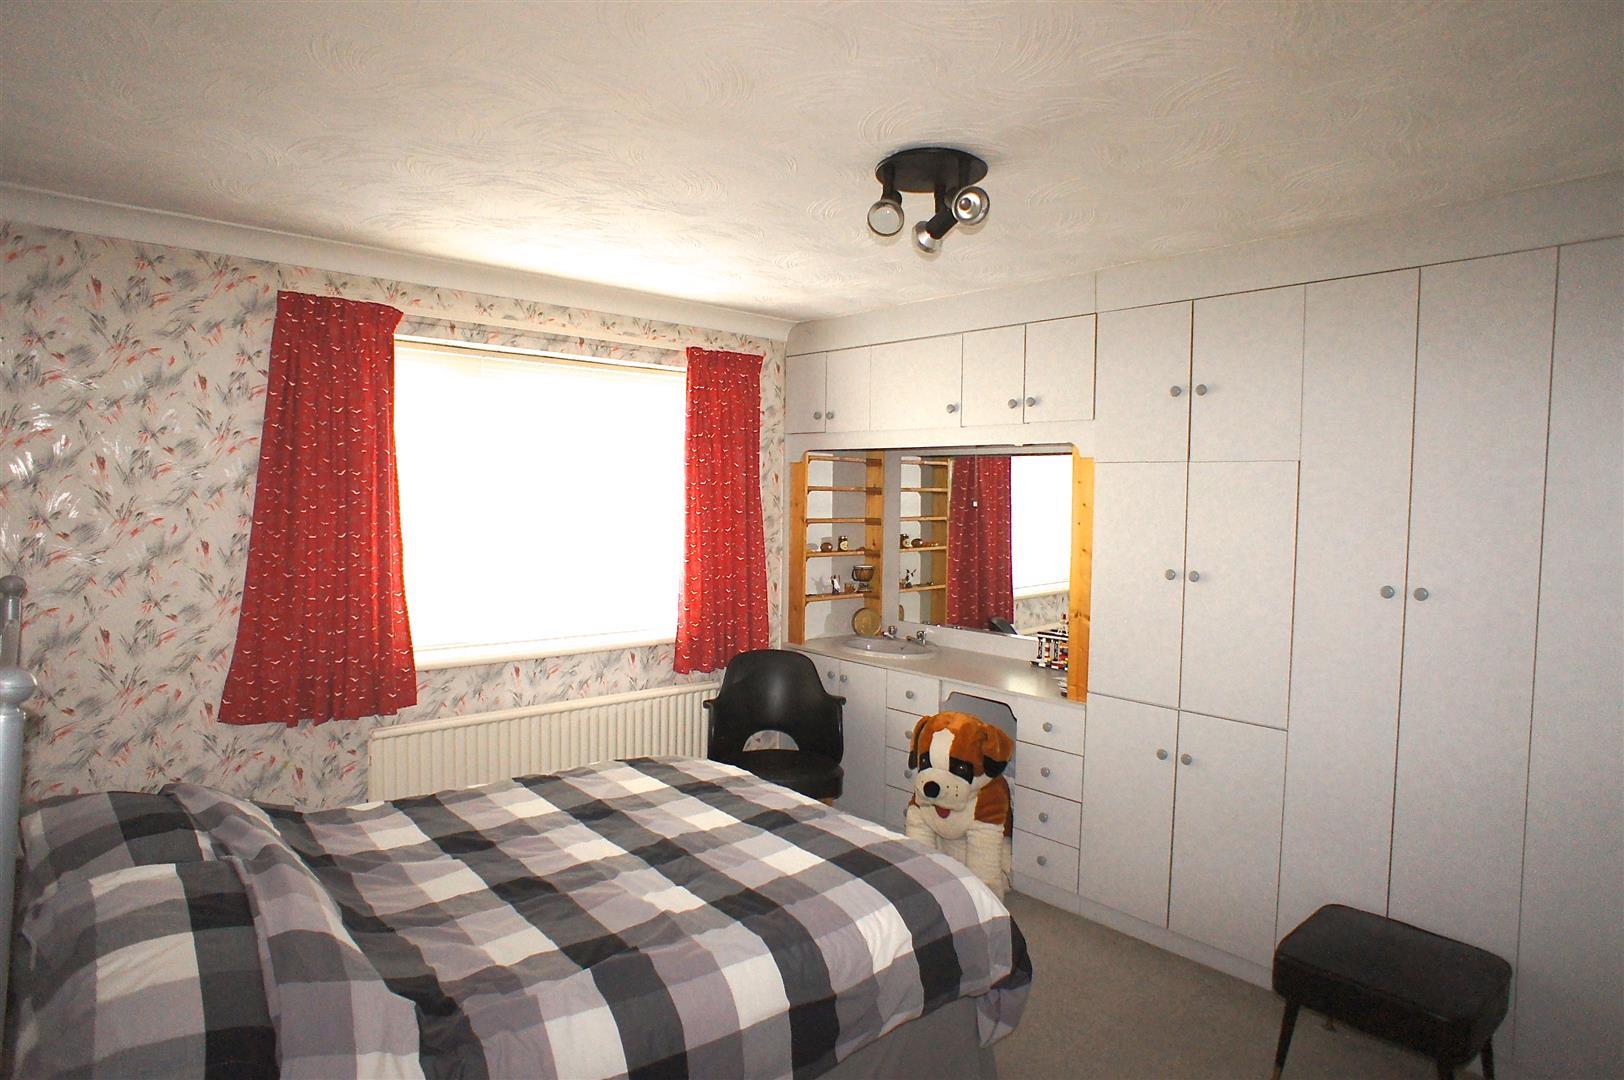 Bedroom 2 - left middle